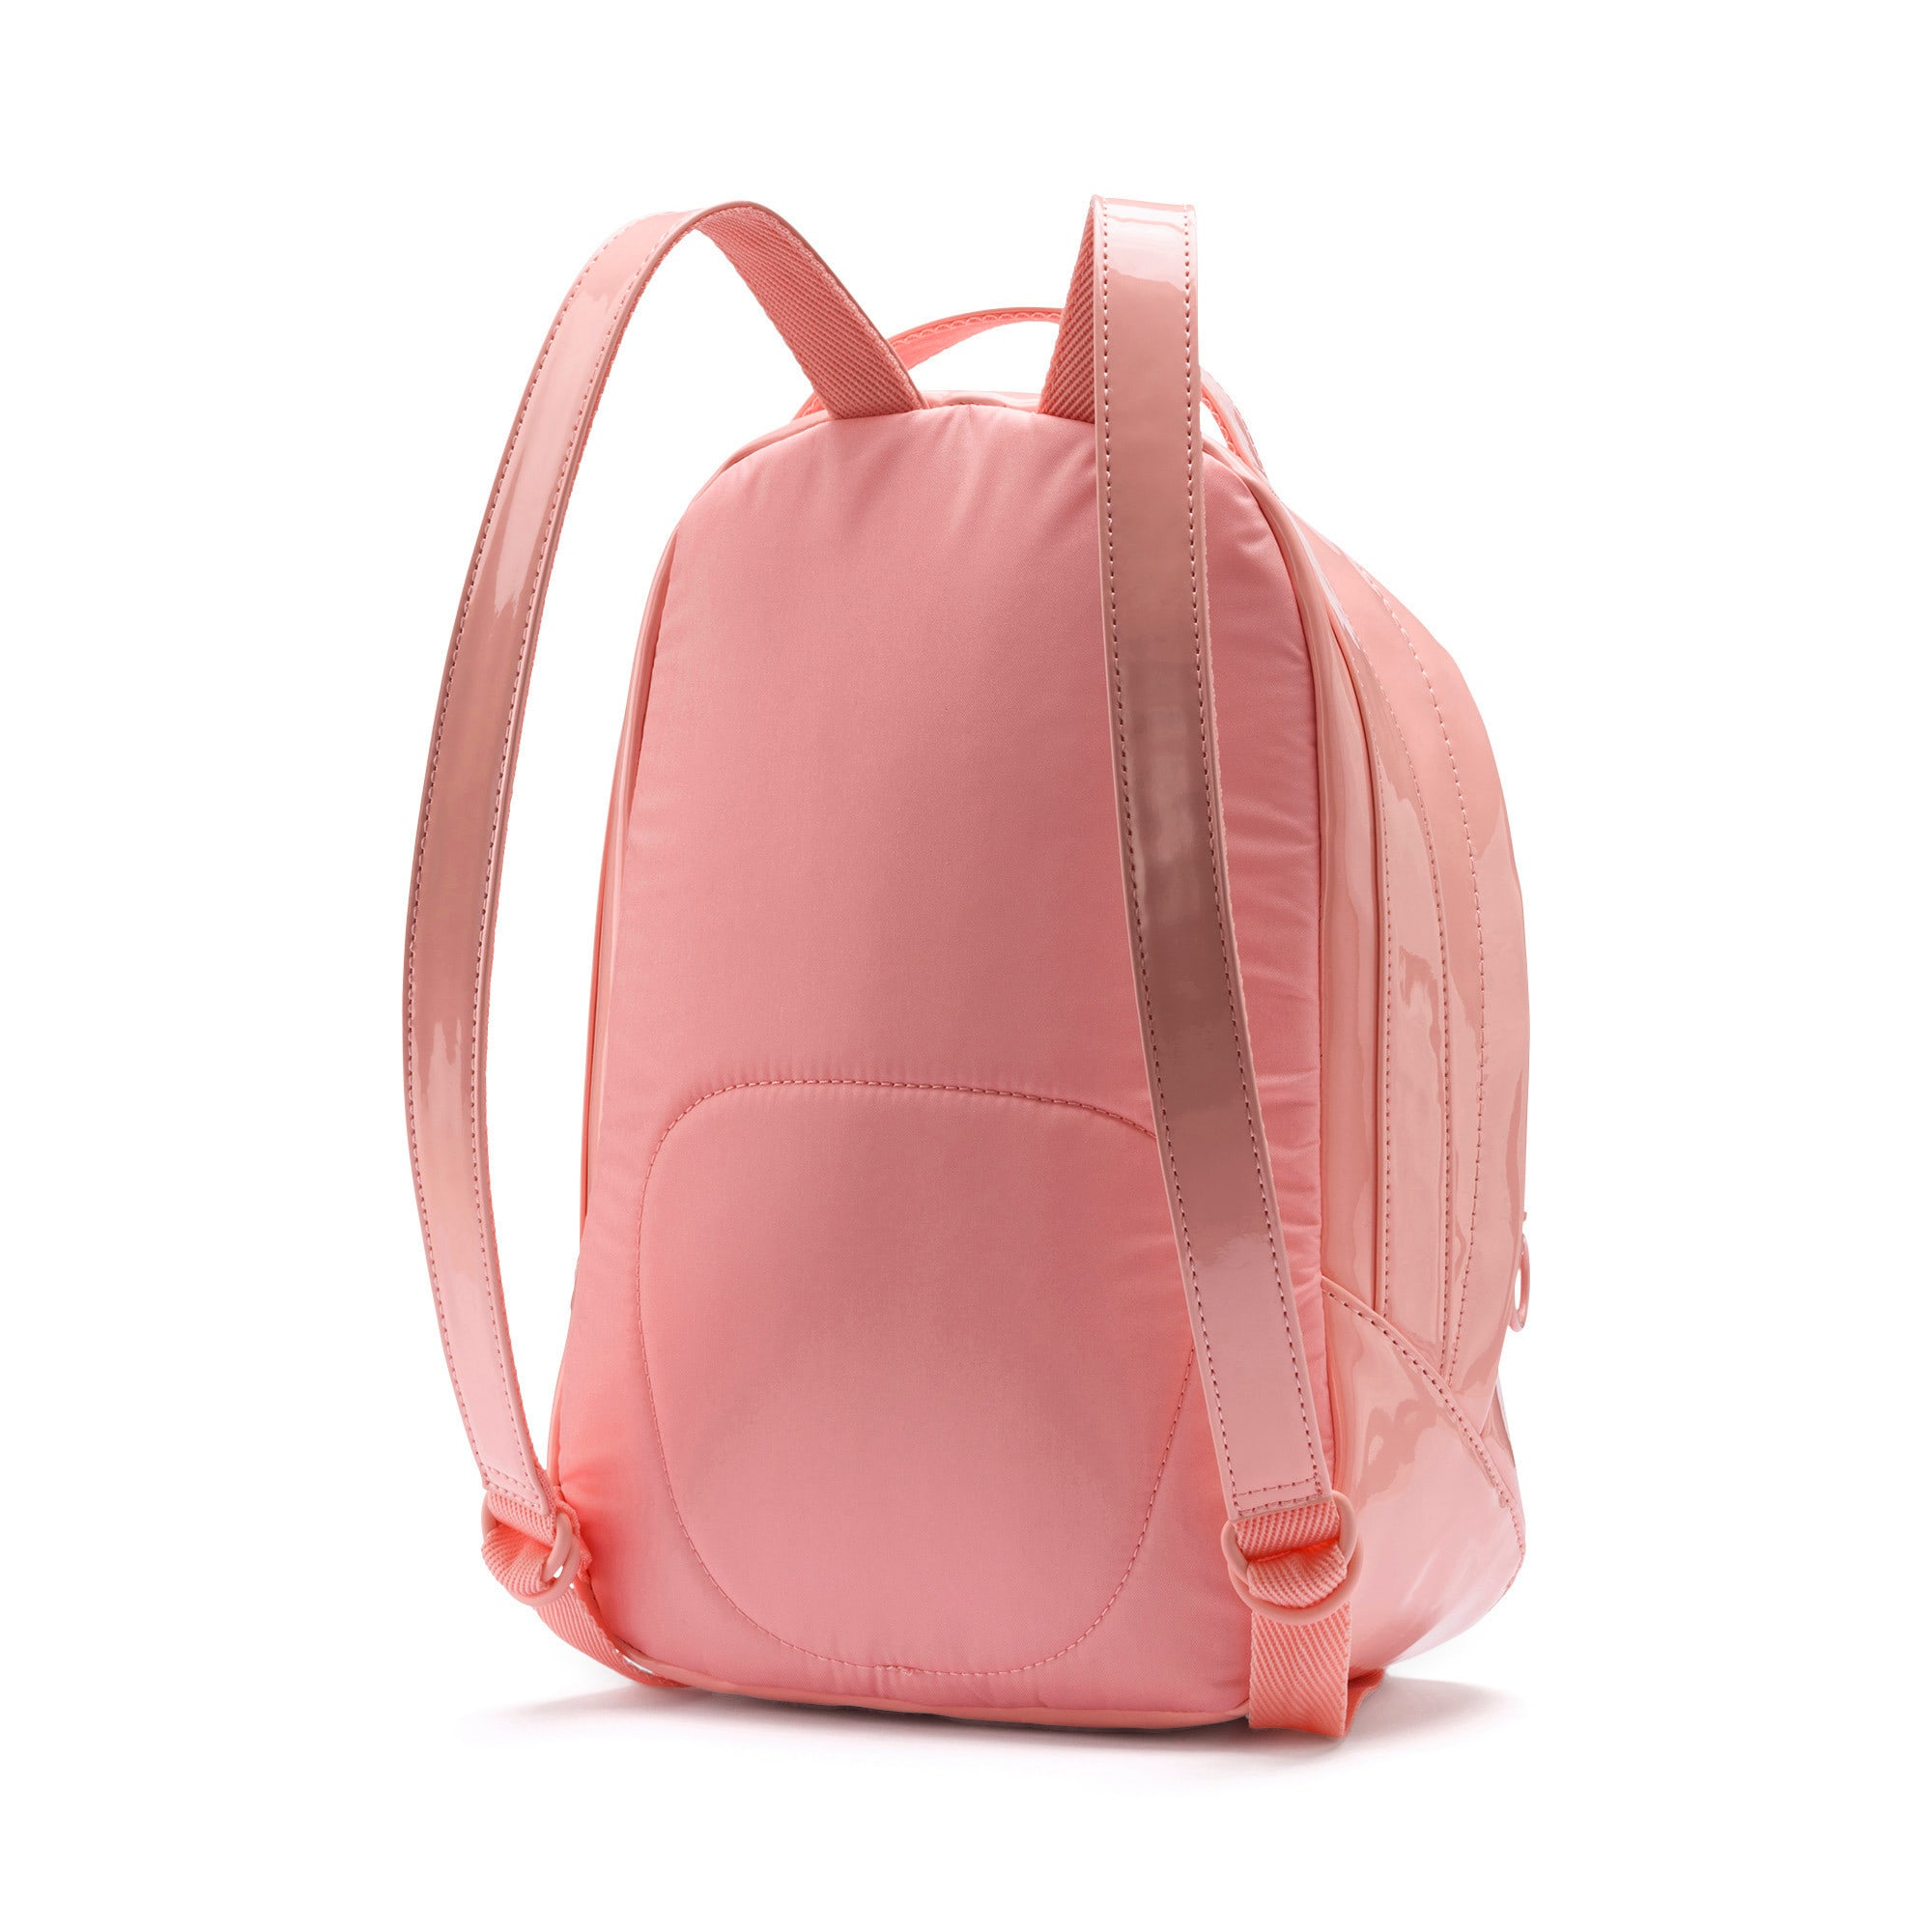 Thumbnail 2 of Prime Archive Crush Women's Backpack, Peach Bud, medium